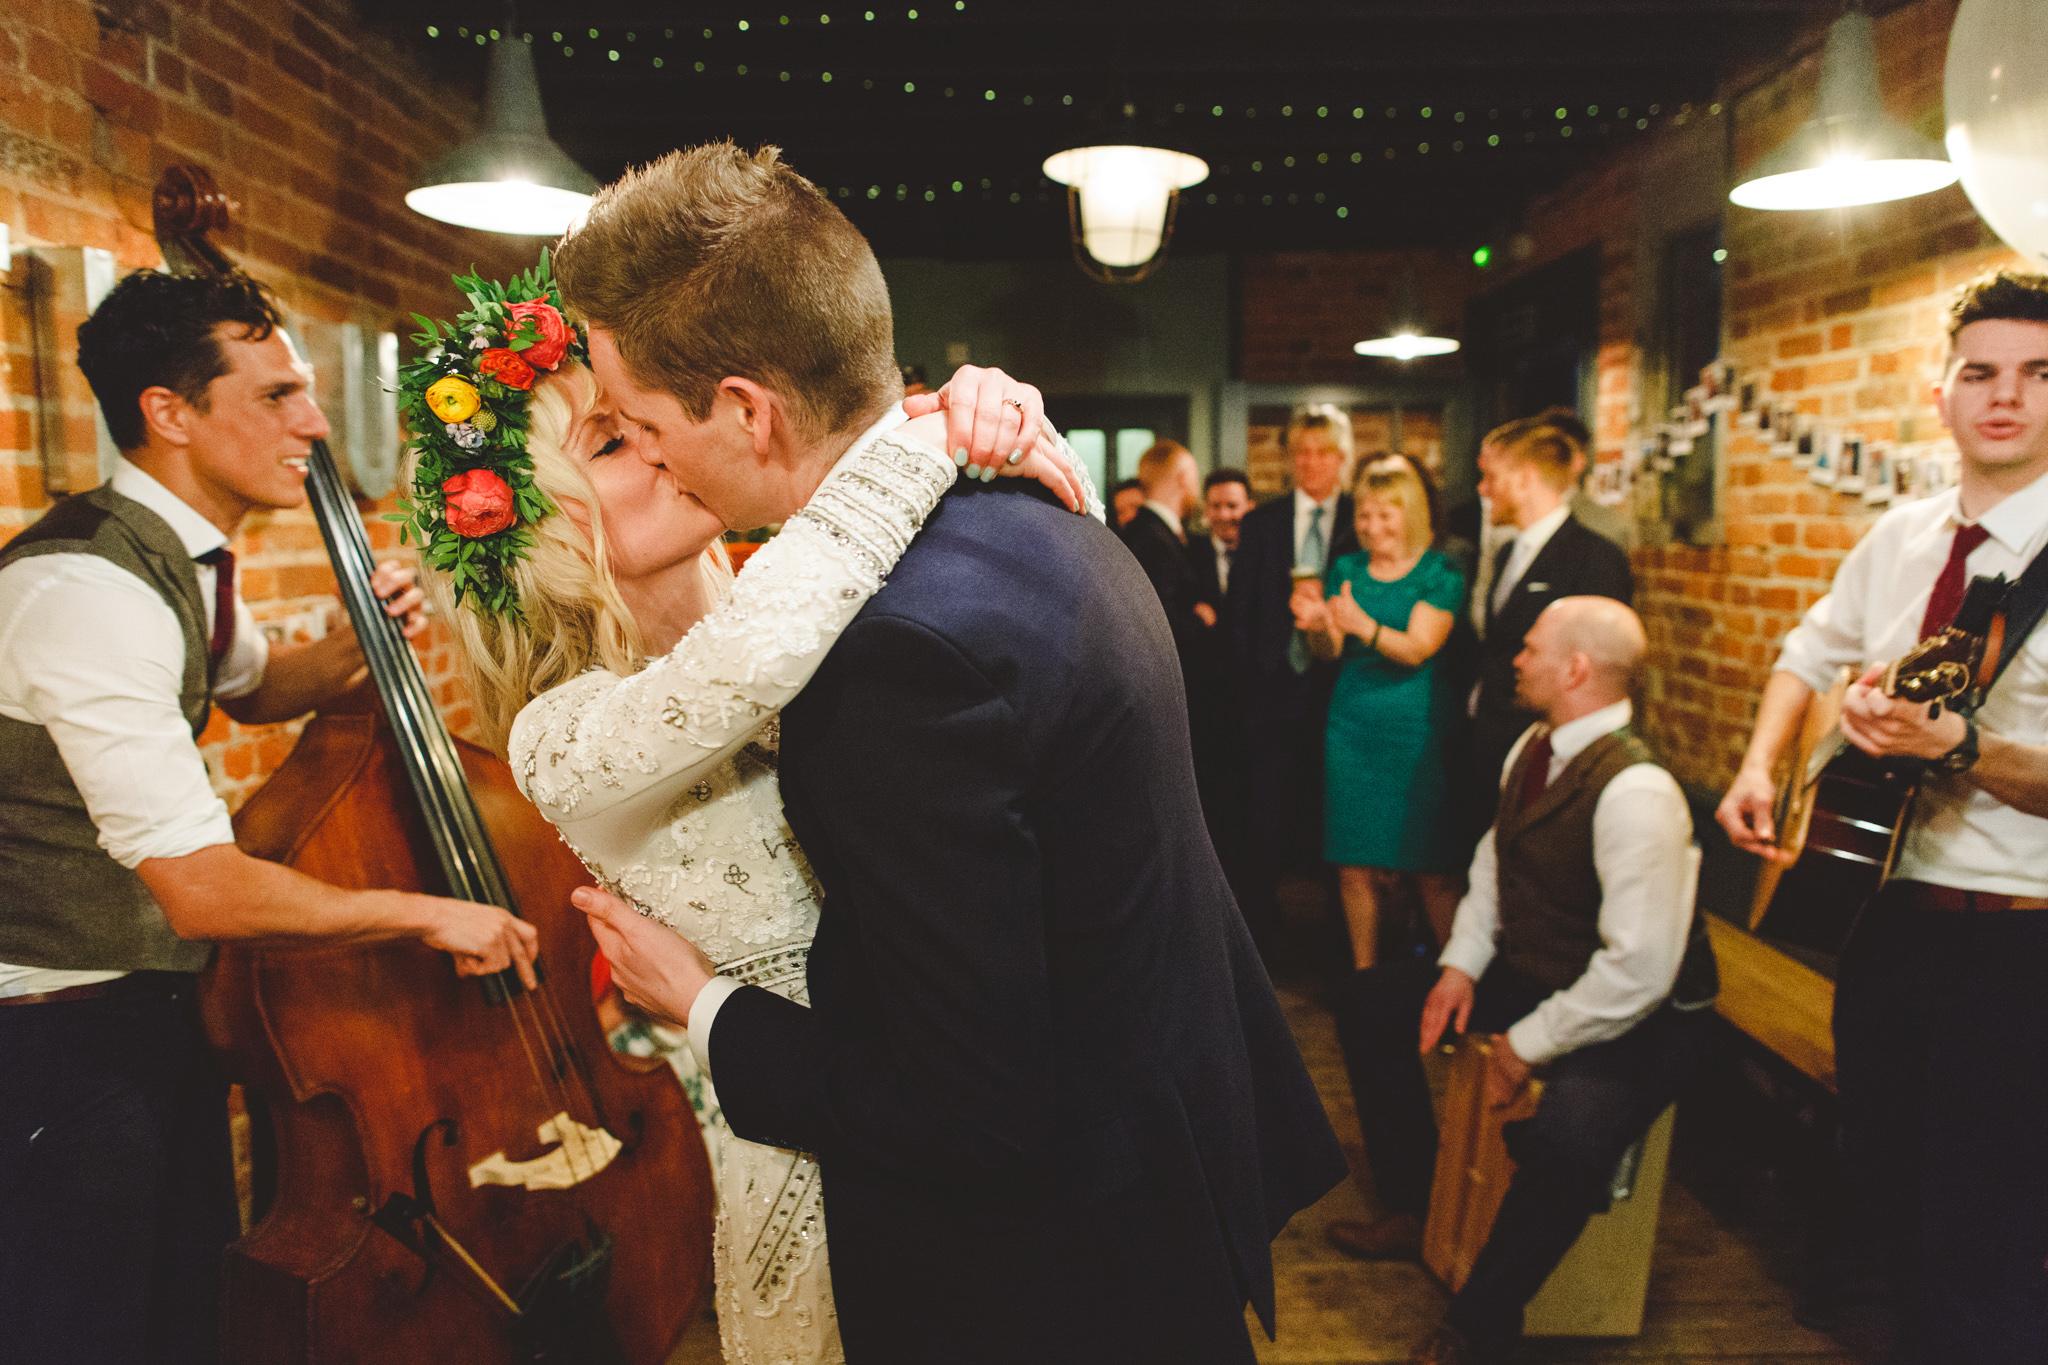 derbyshire-wedding-photographer-march-april-15.jpg